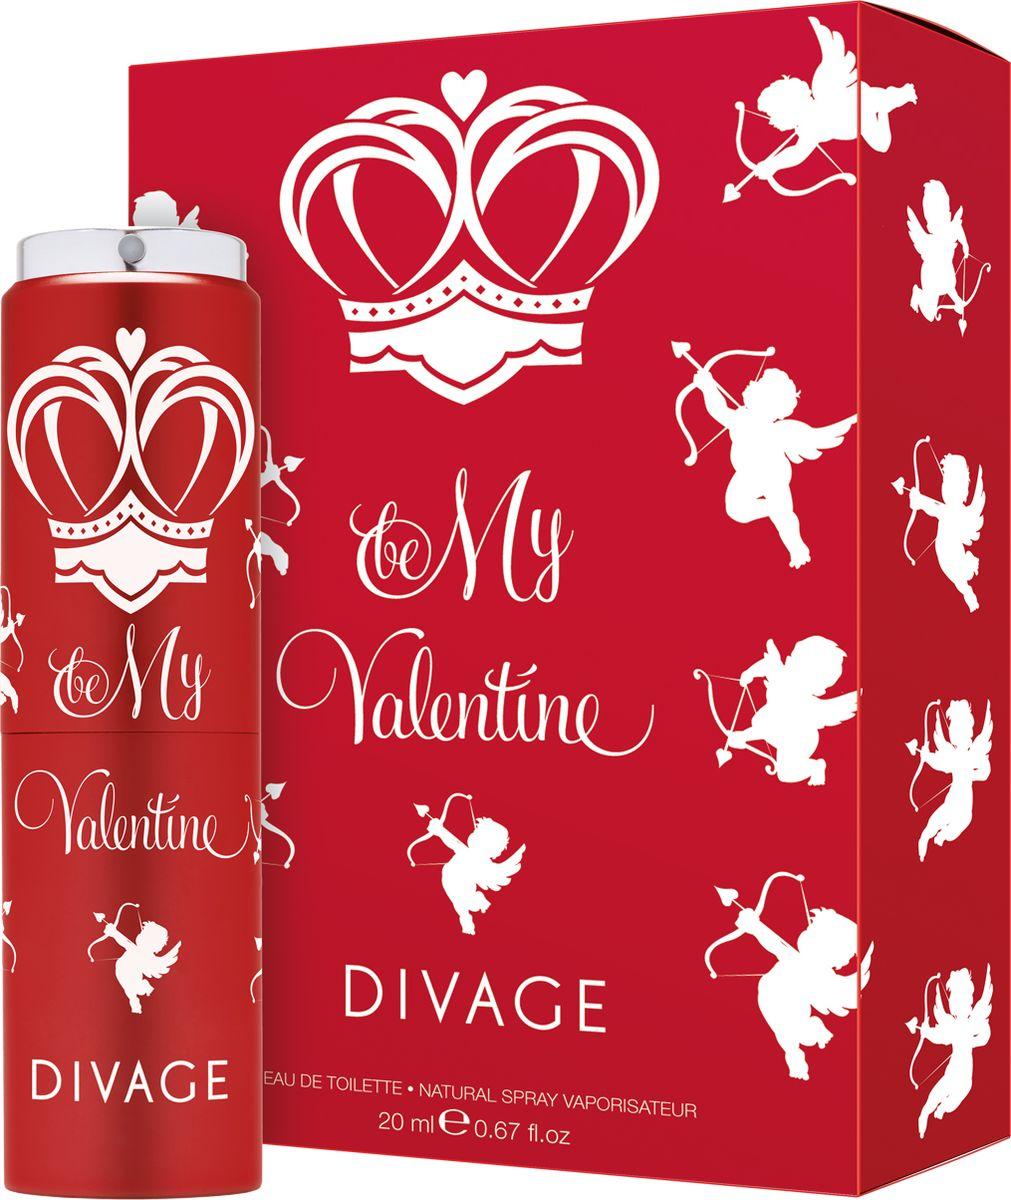 Divage Туалетная Вода Be my valentine 20 мл